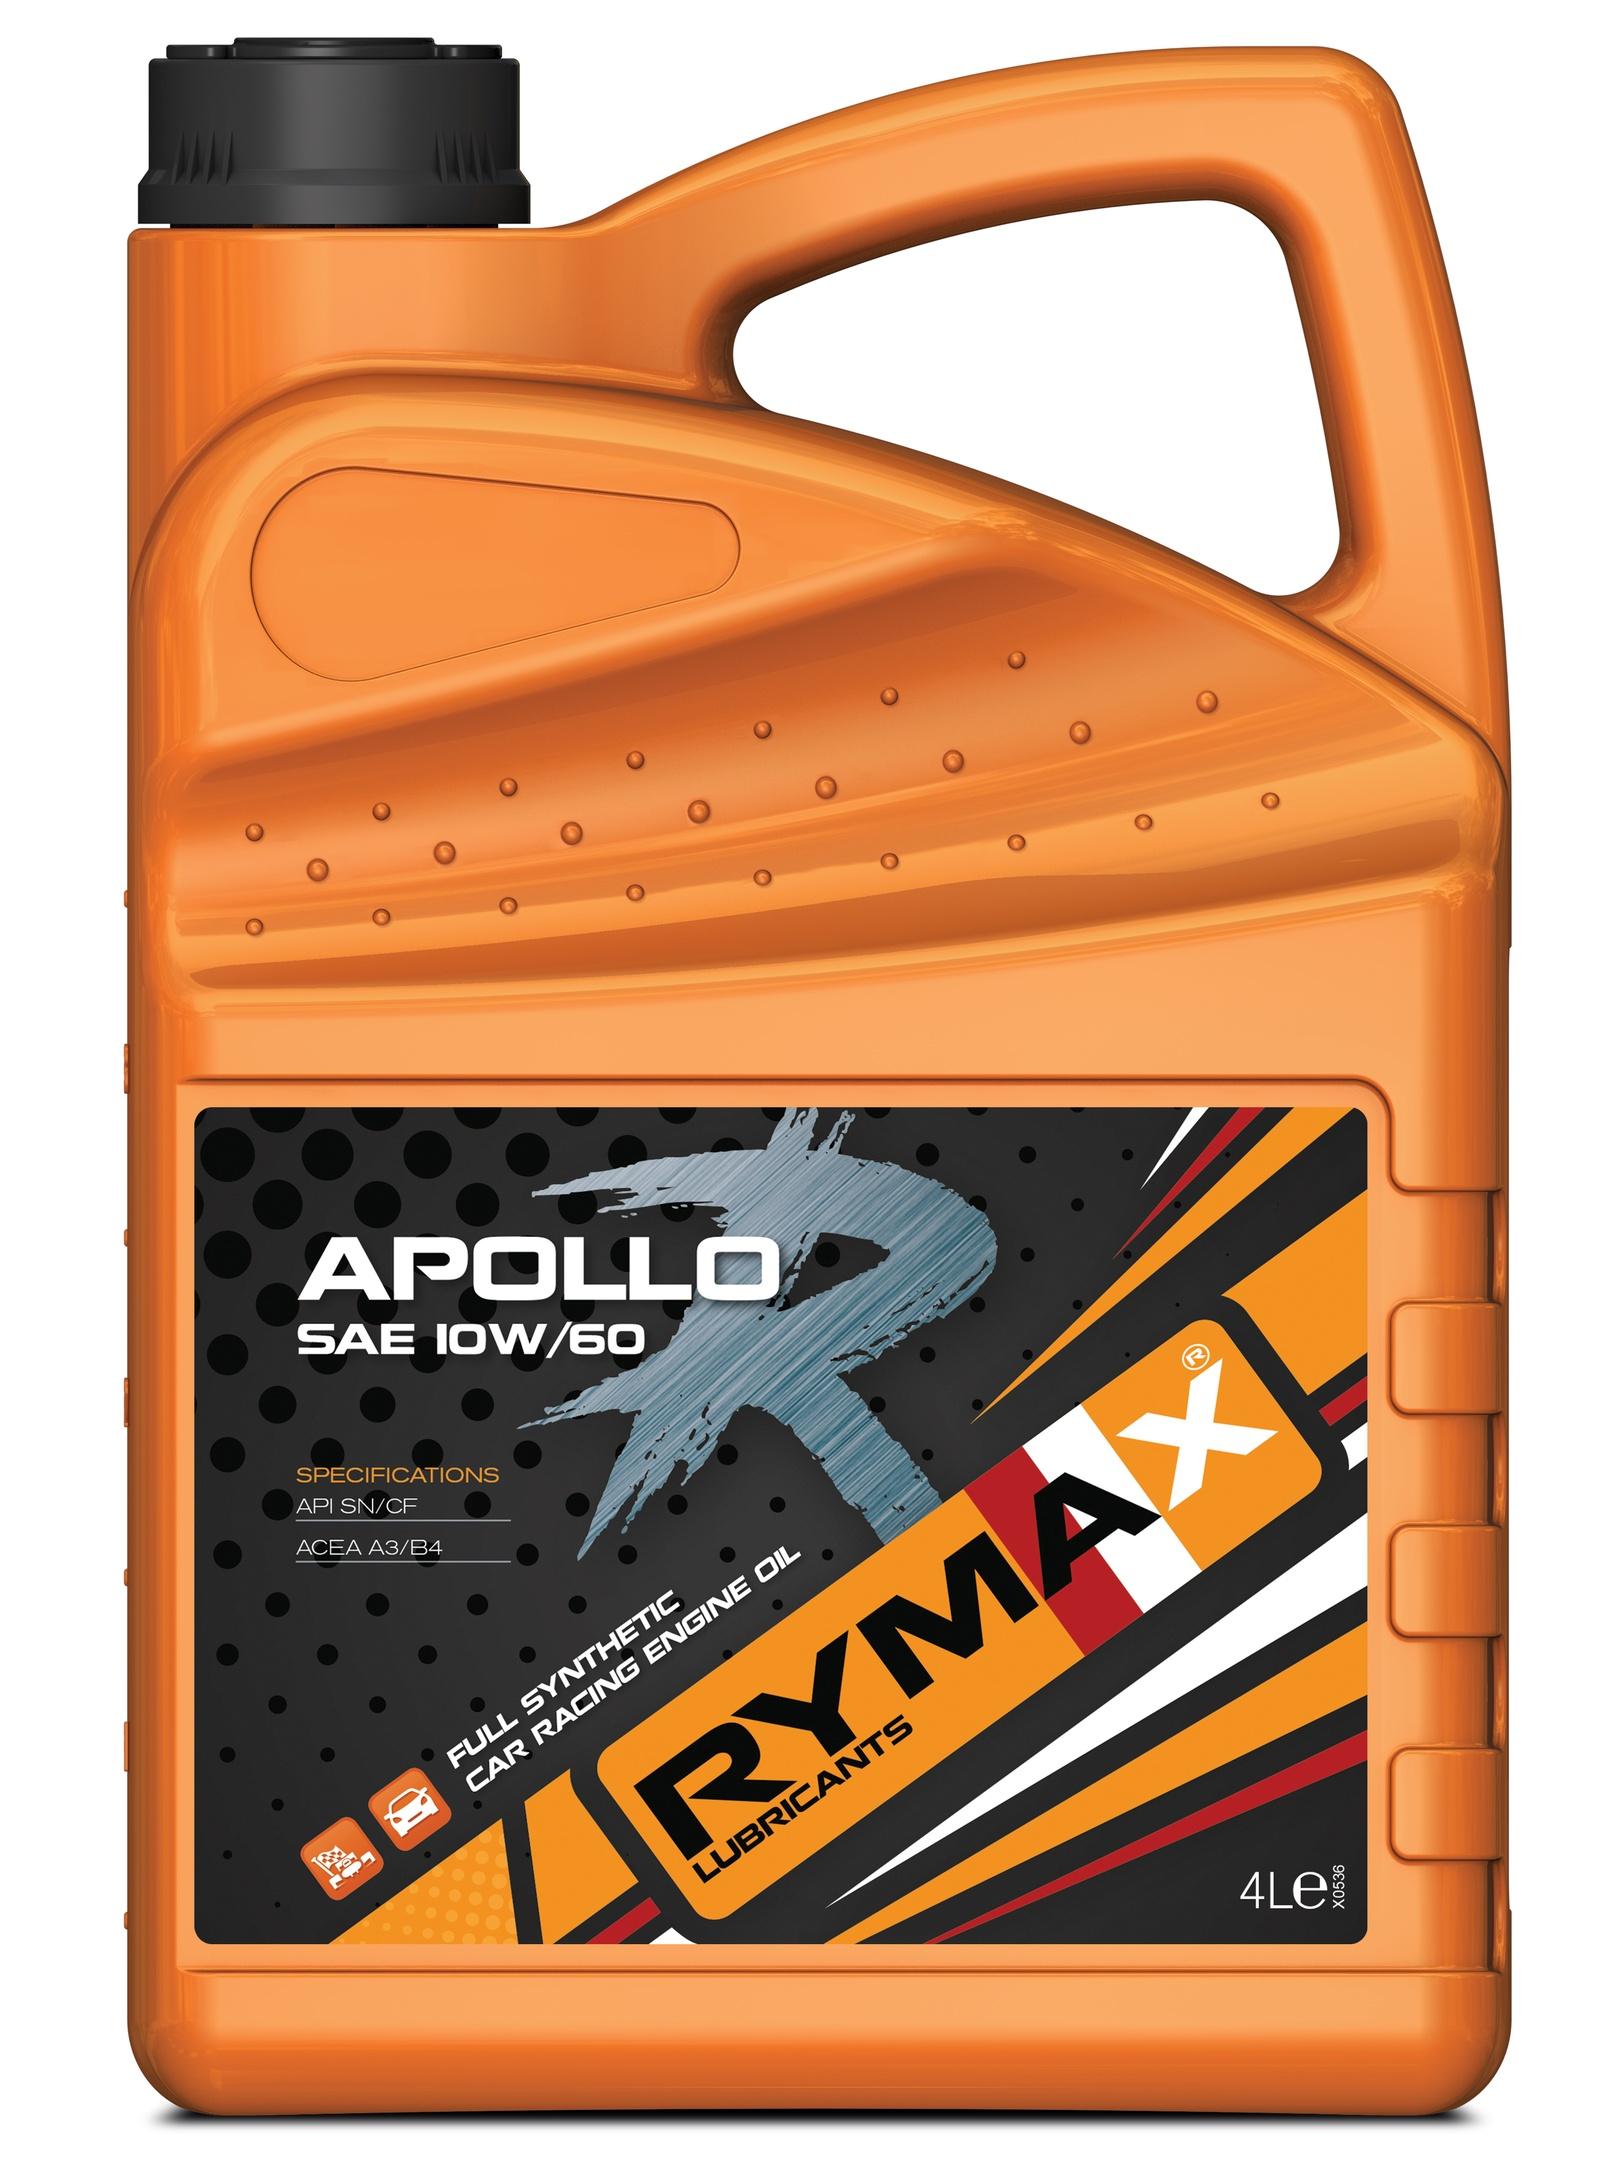 Моторное масло Rymax Apollo R SAE 10W-60, API SN/CF, ACEA A3/B4, спортивное на основе ПАО, 4 л